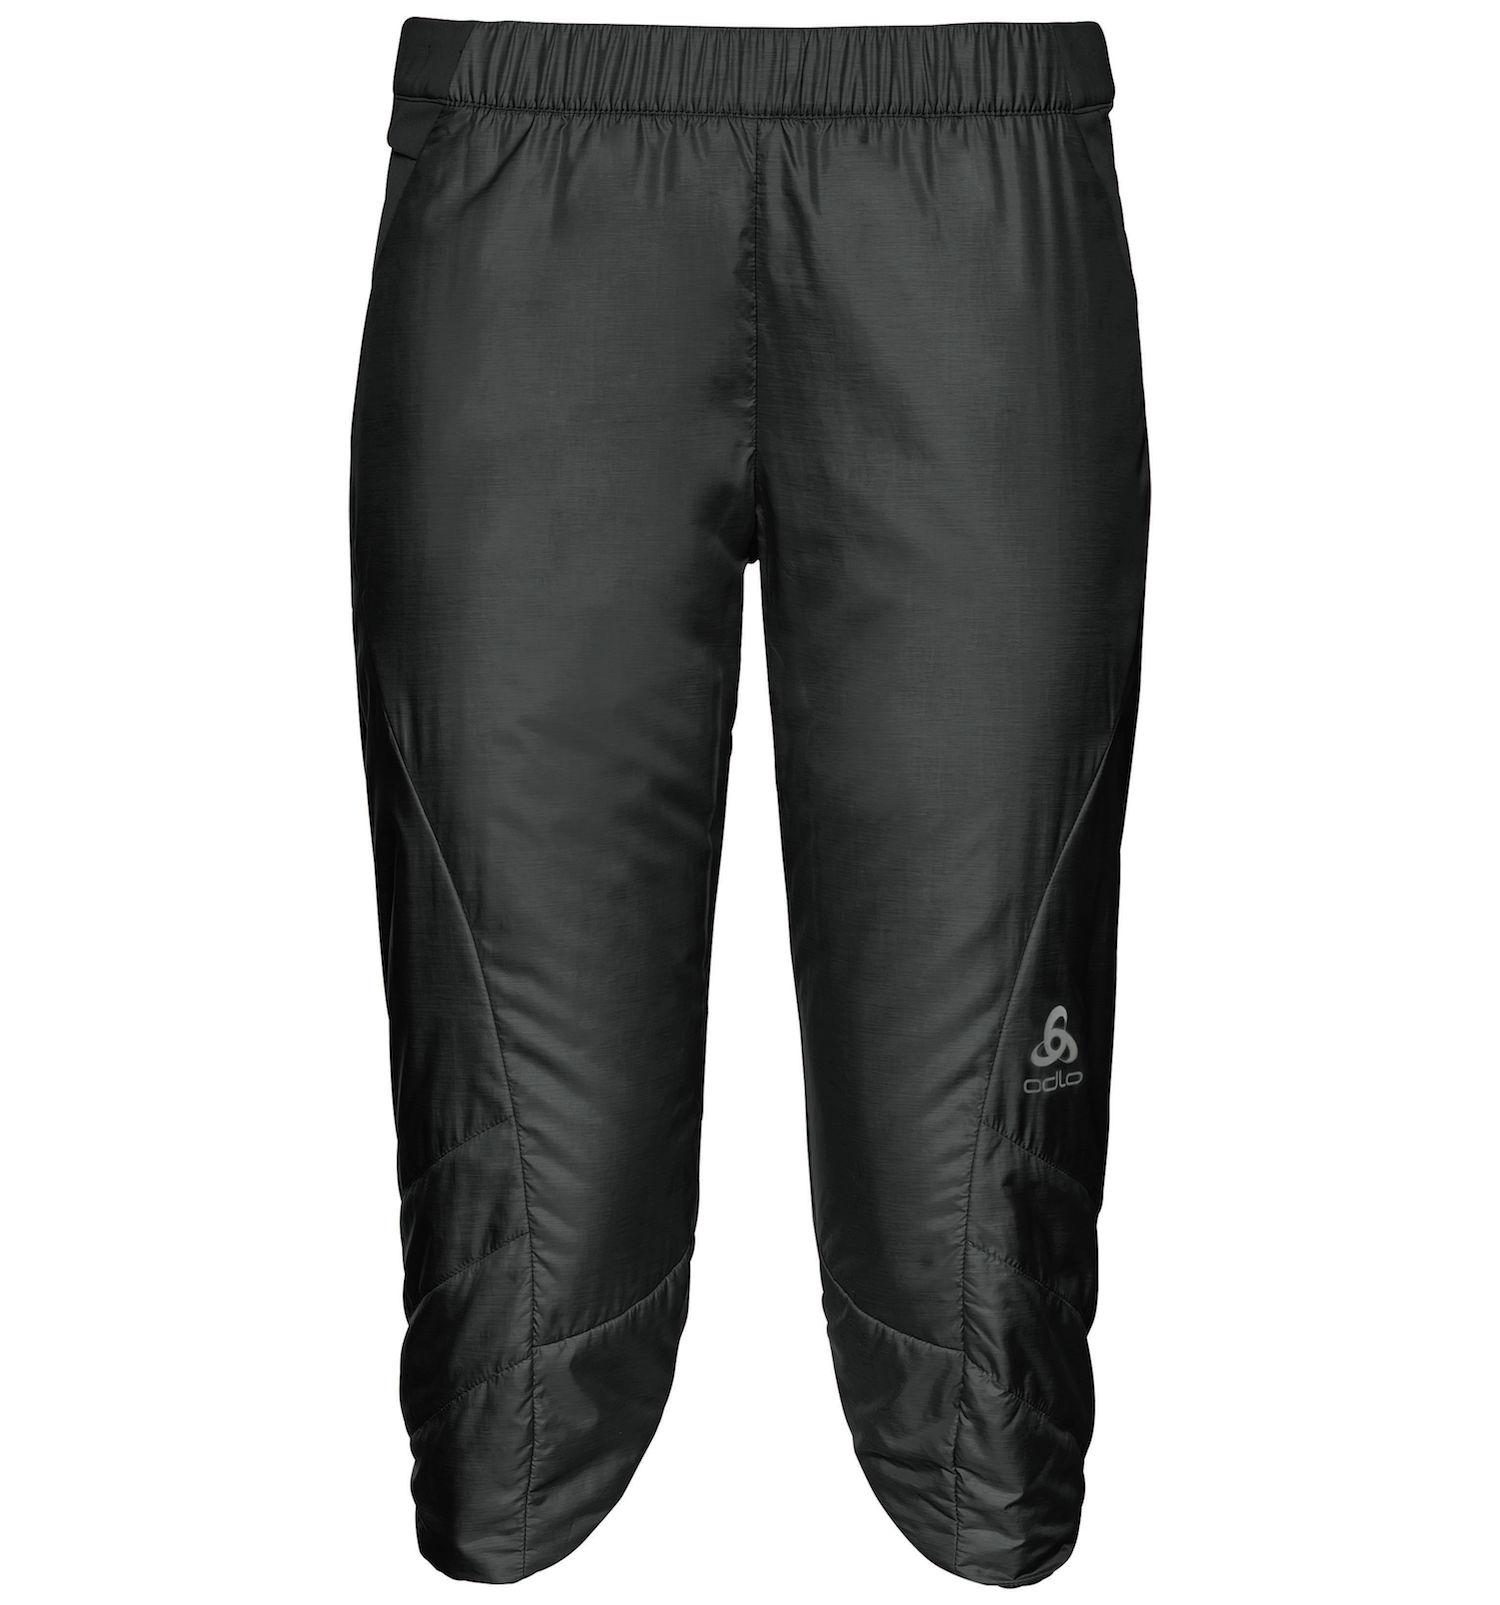 Odlo - Shorts Irbis - Shorts - Women's